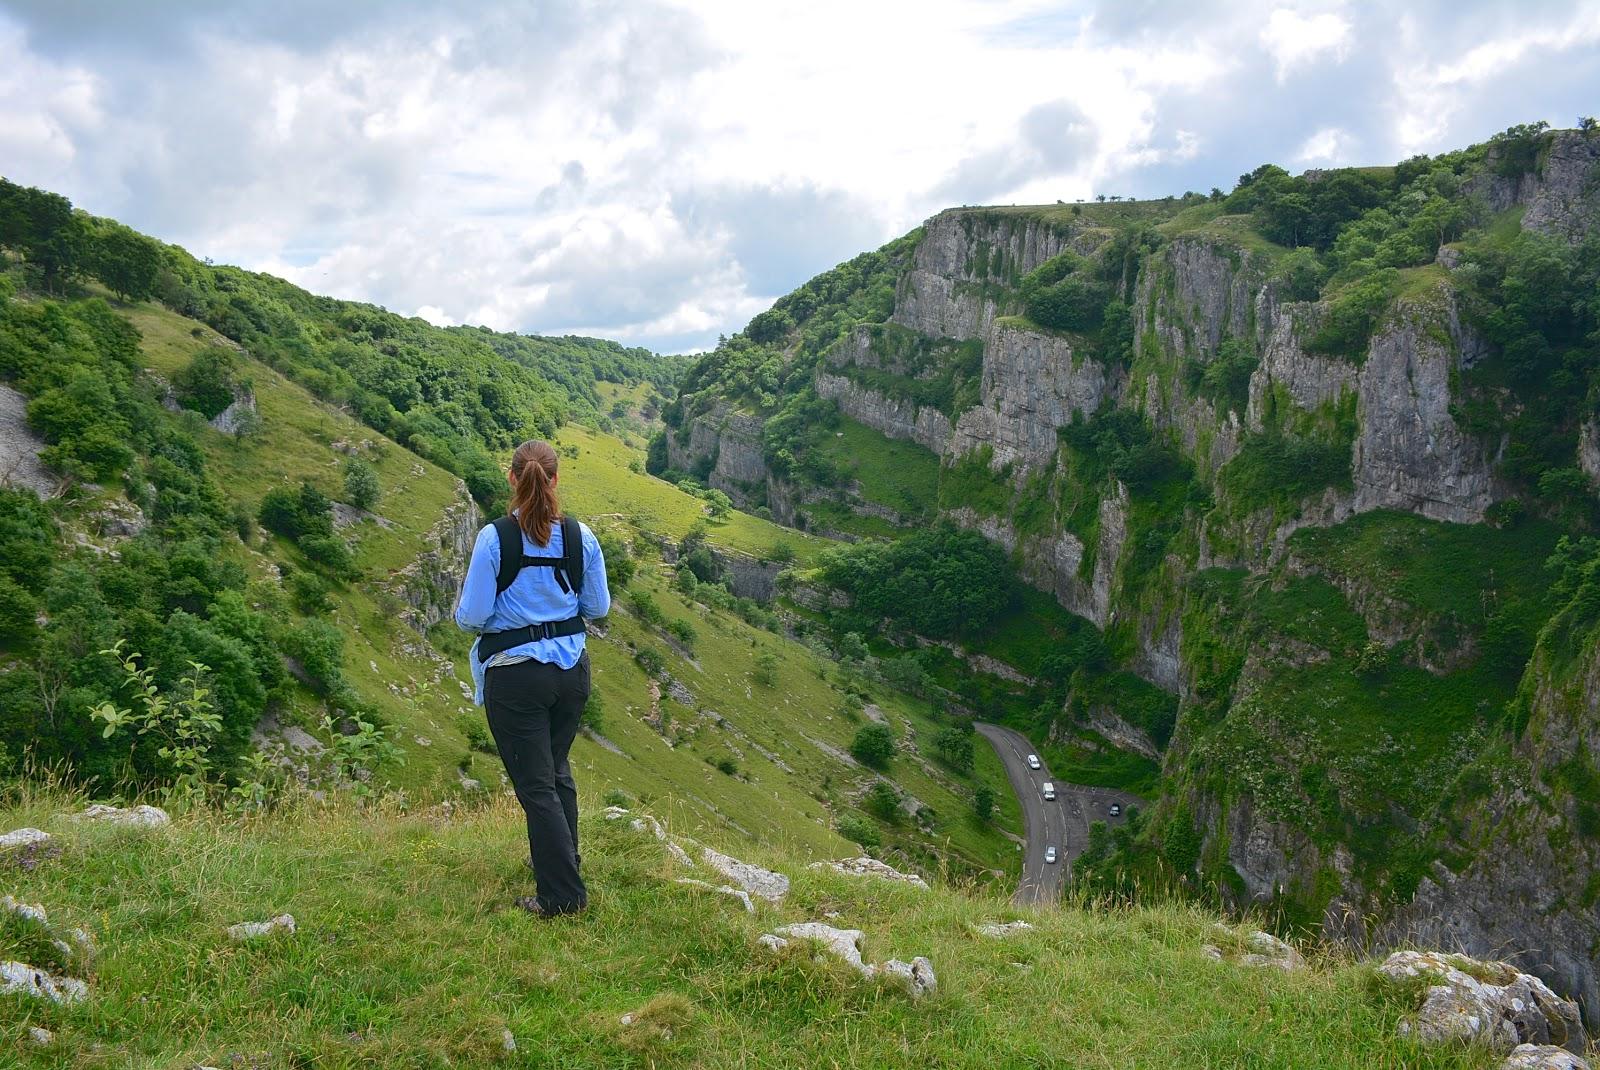 Cheddar Gorge in Somerset